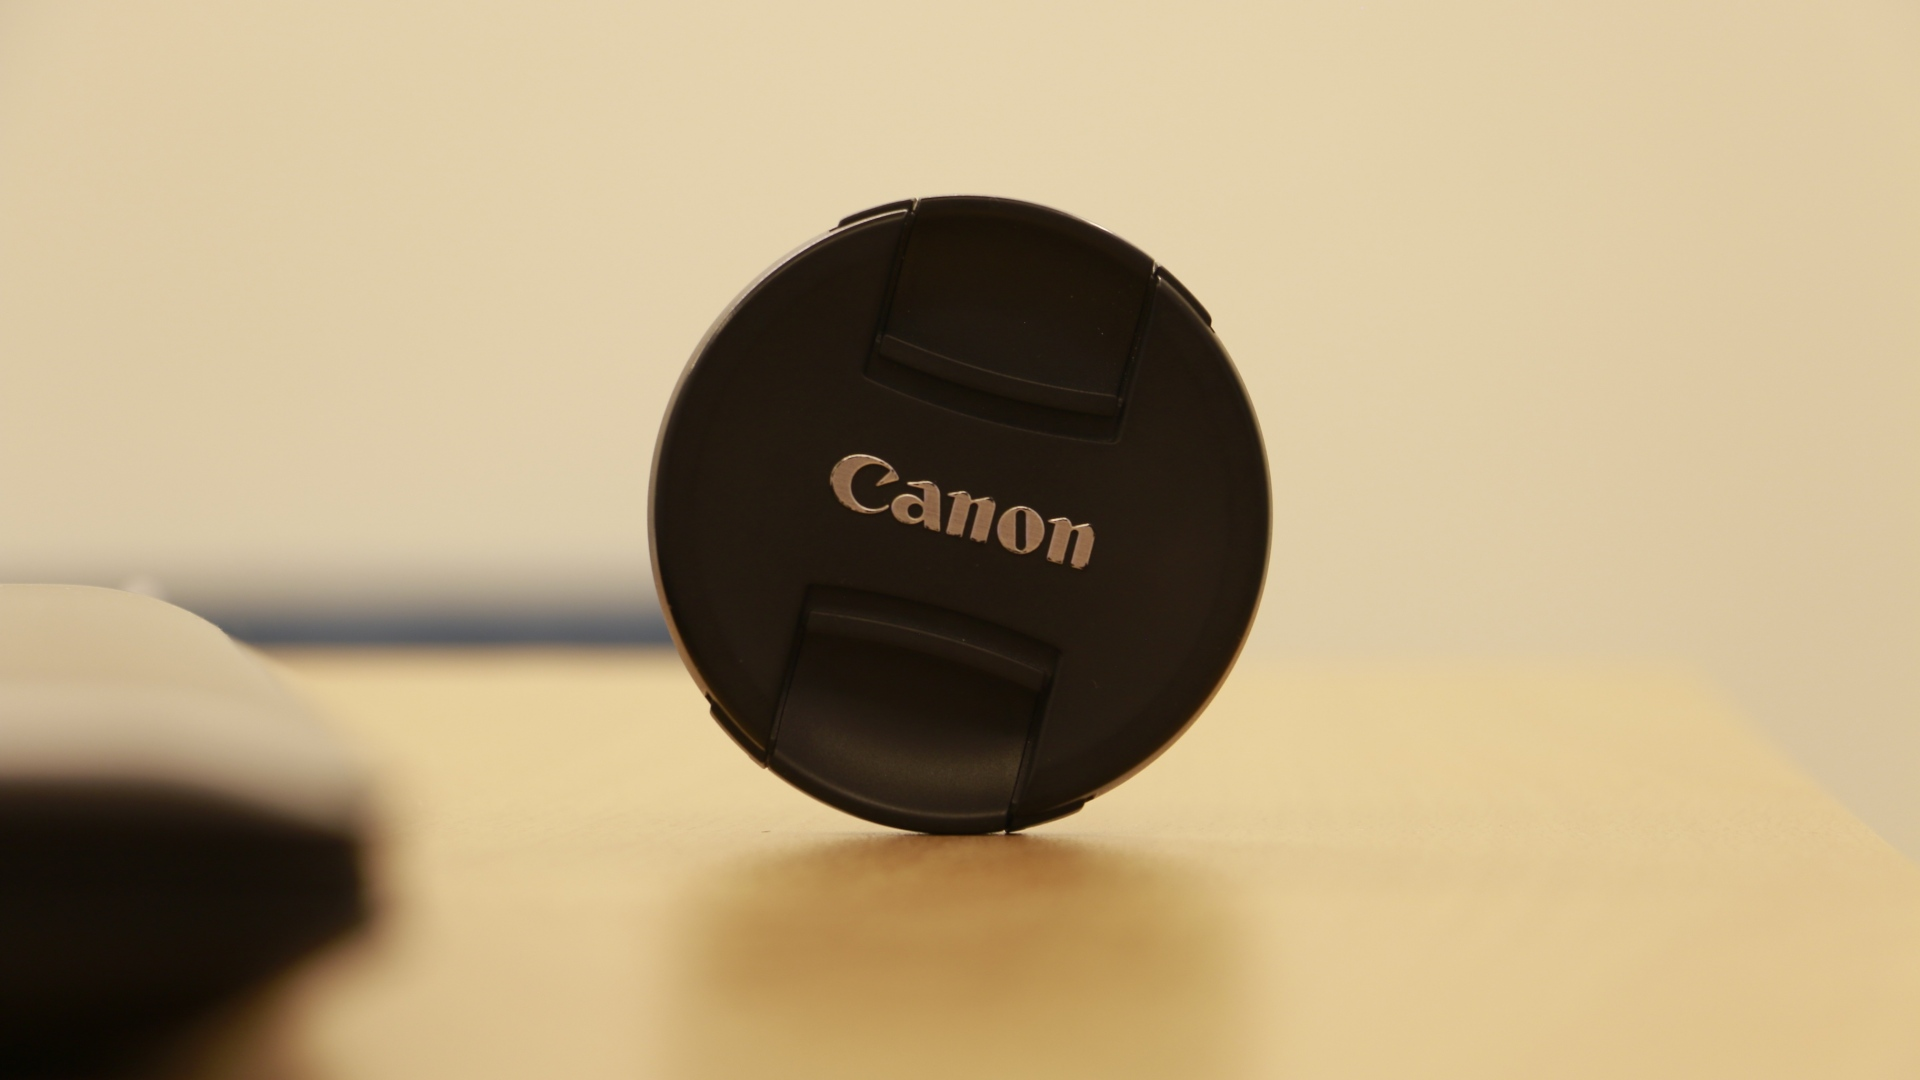 hd hintergrundbilder kamera canon linse kappe 1920x1080